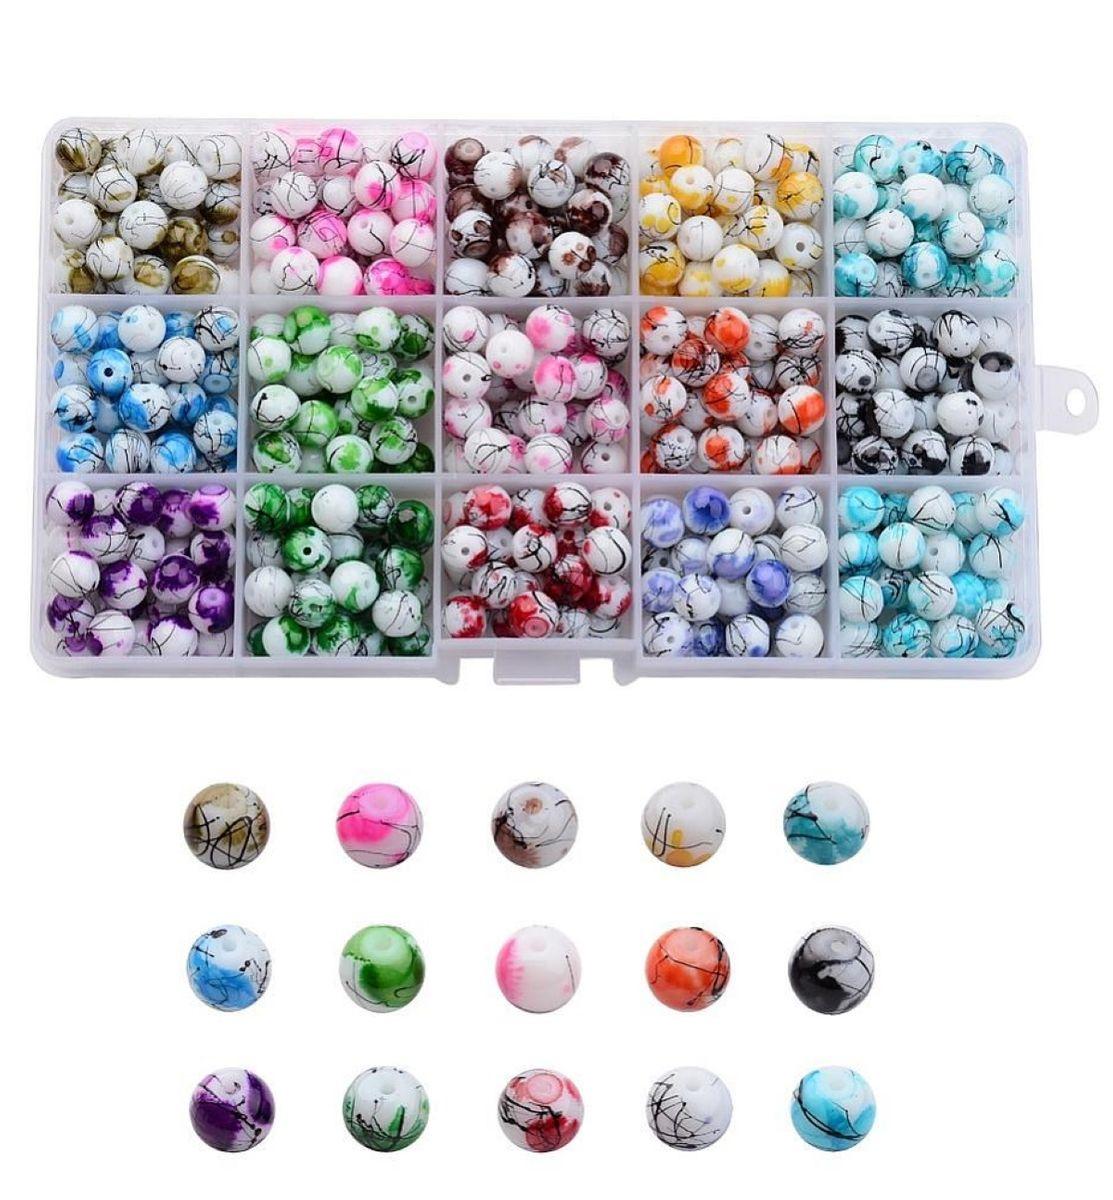 Glasperlen Set marmoriert 8mm, 1 Box, ca. 400 Stück, 15 verschiedene Farben